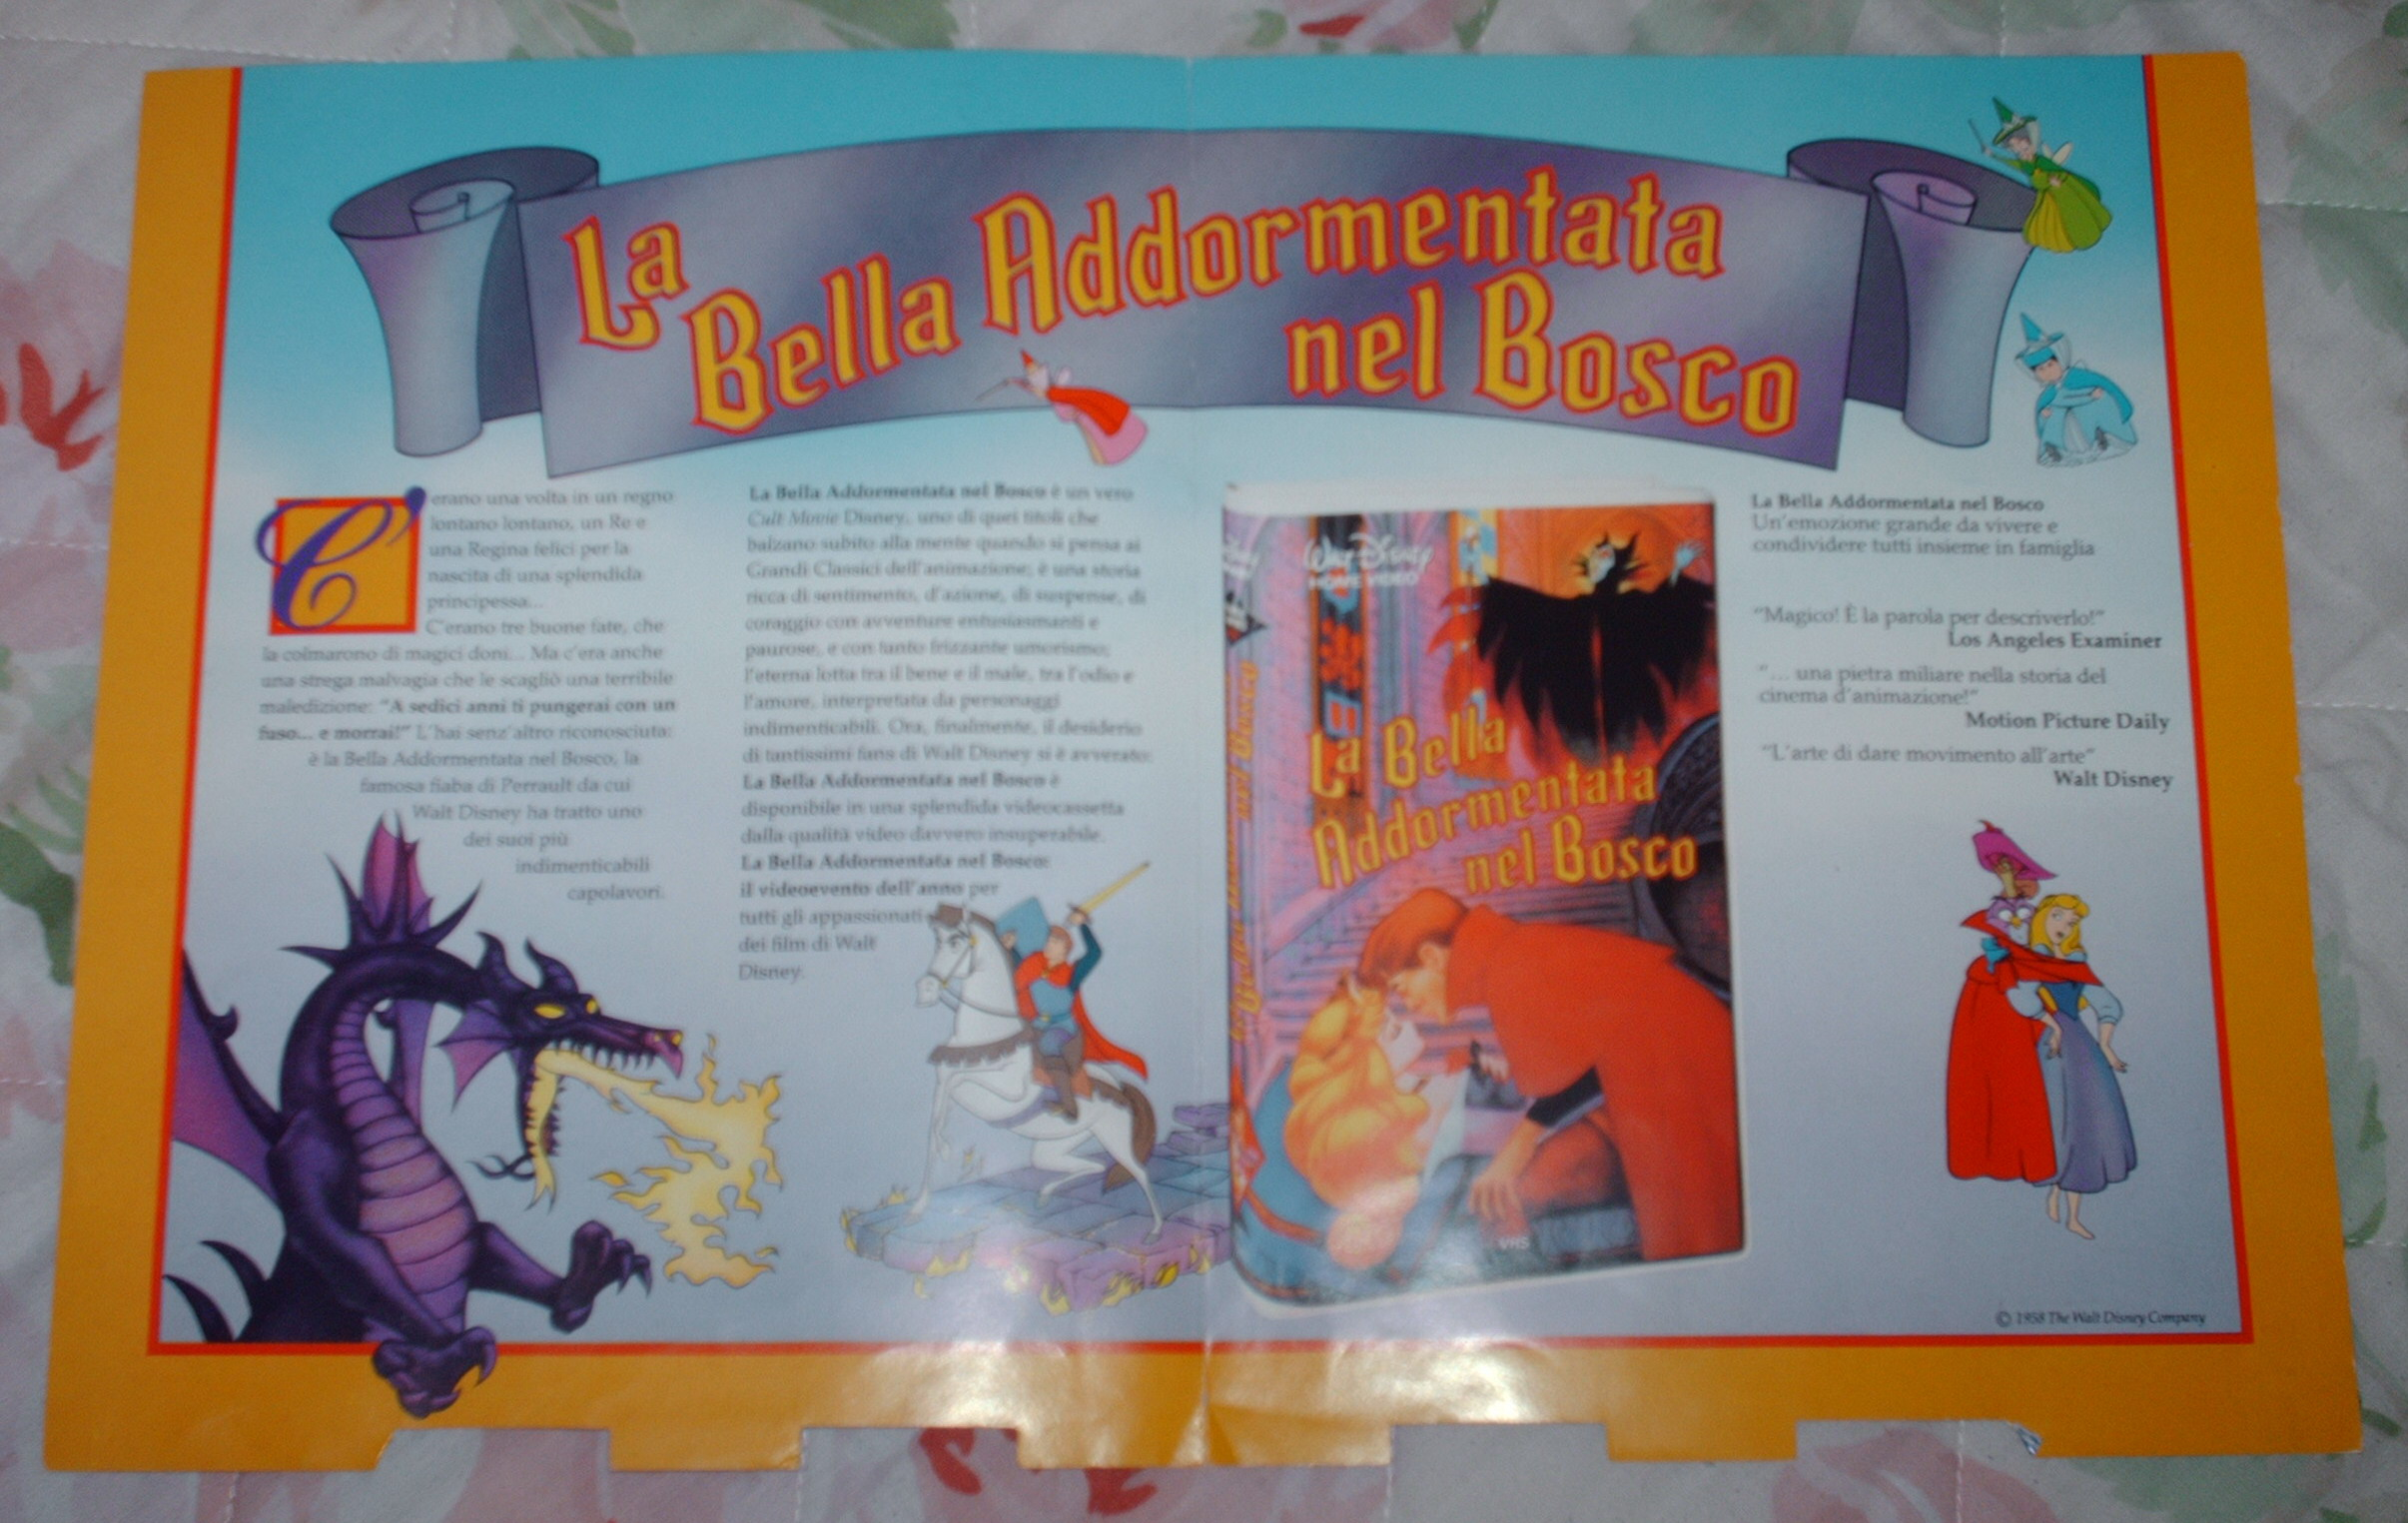 La bella addormentata 1994 full vintage movie - 1 10